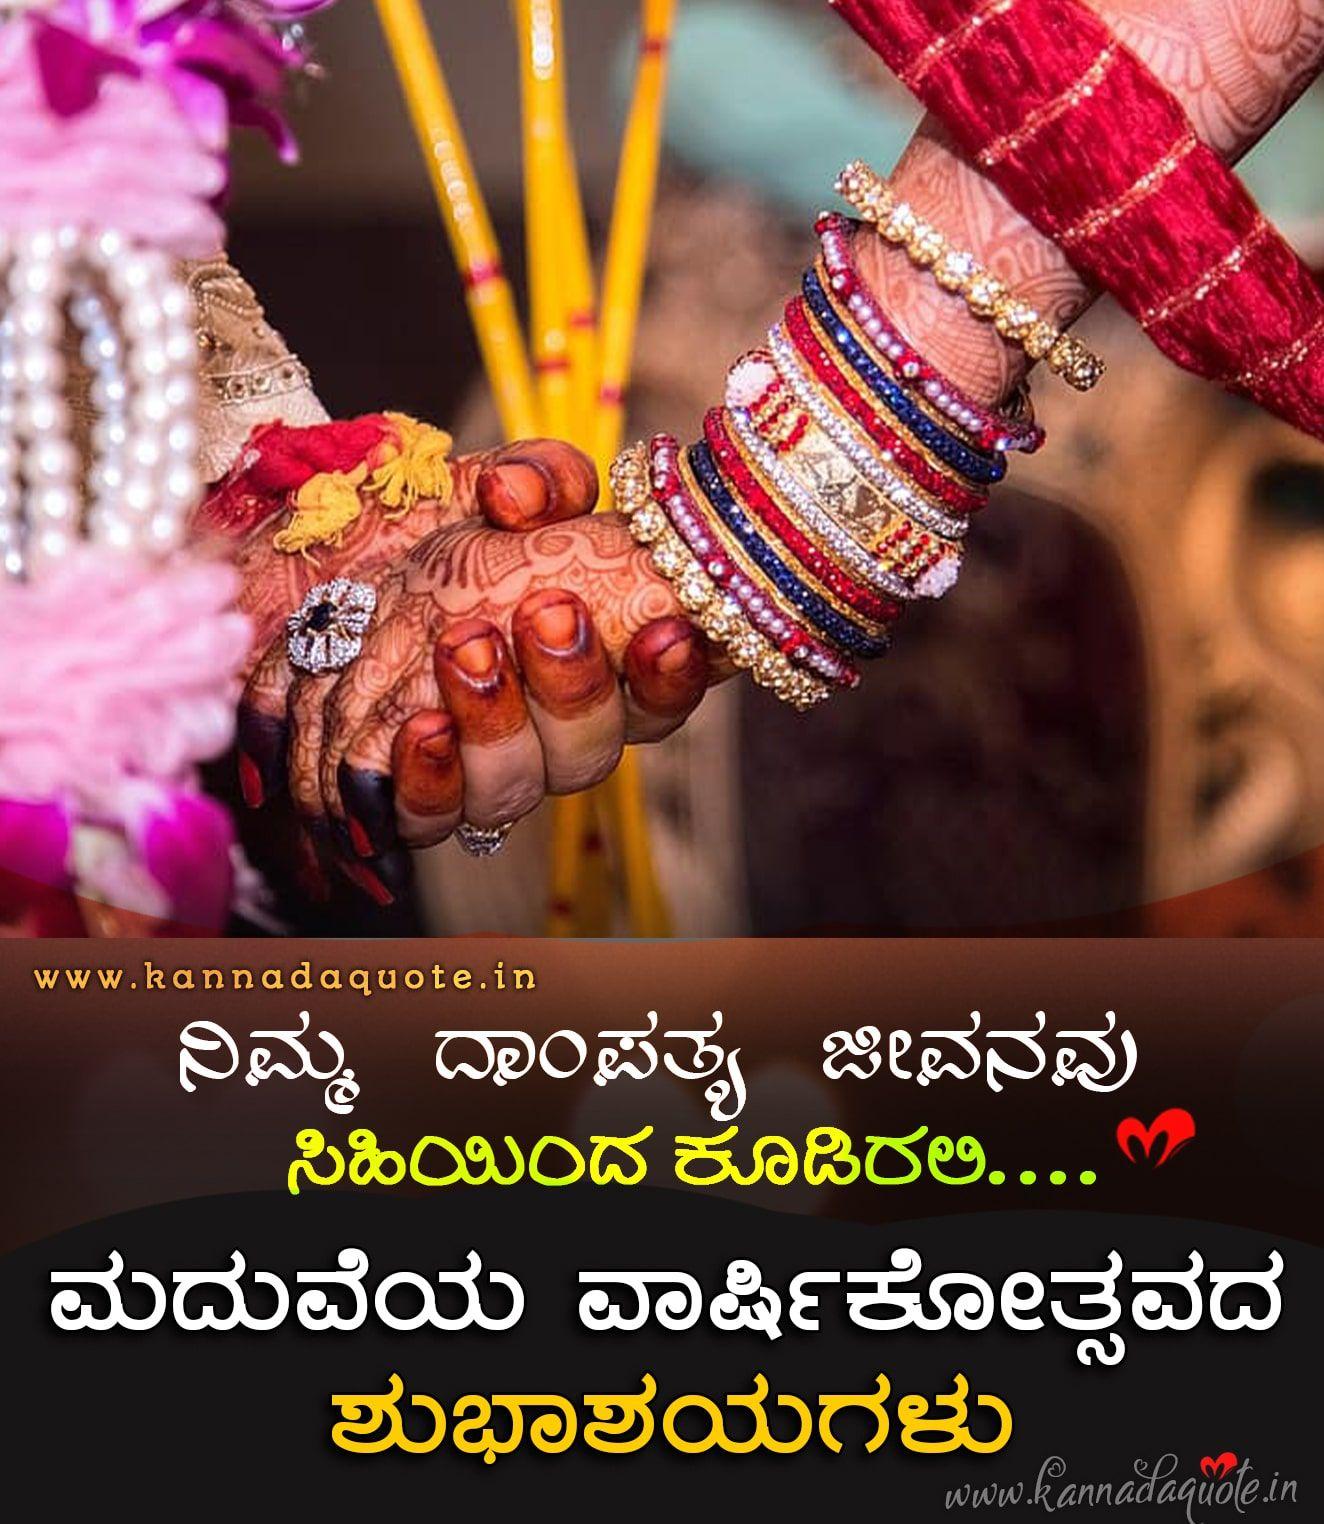 Kannada Language Wedding Anniversary Wishes In Kannada Sms Happy Wedding Anniversary Wishes Wedding Anniversary Wishes Happy Wedding